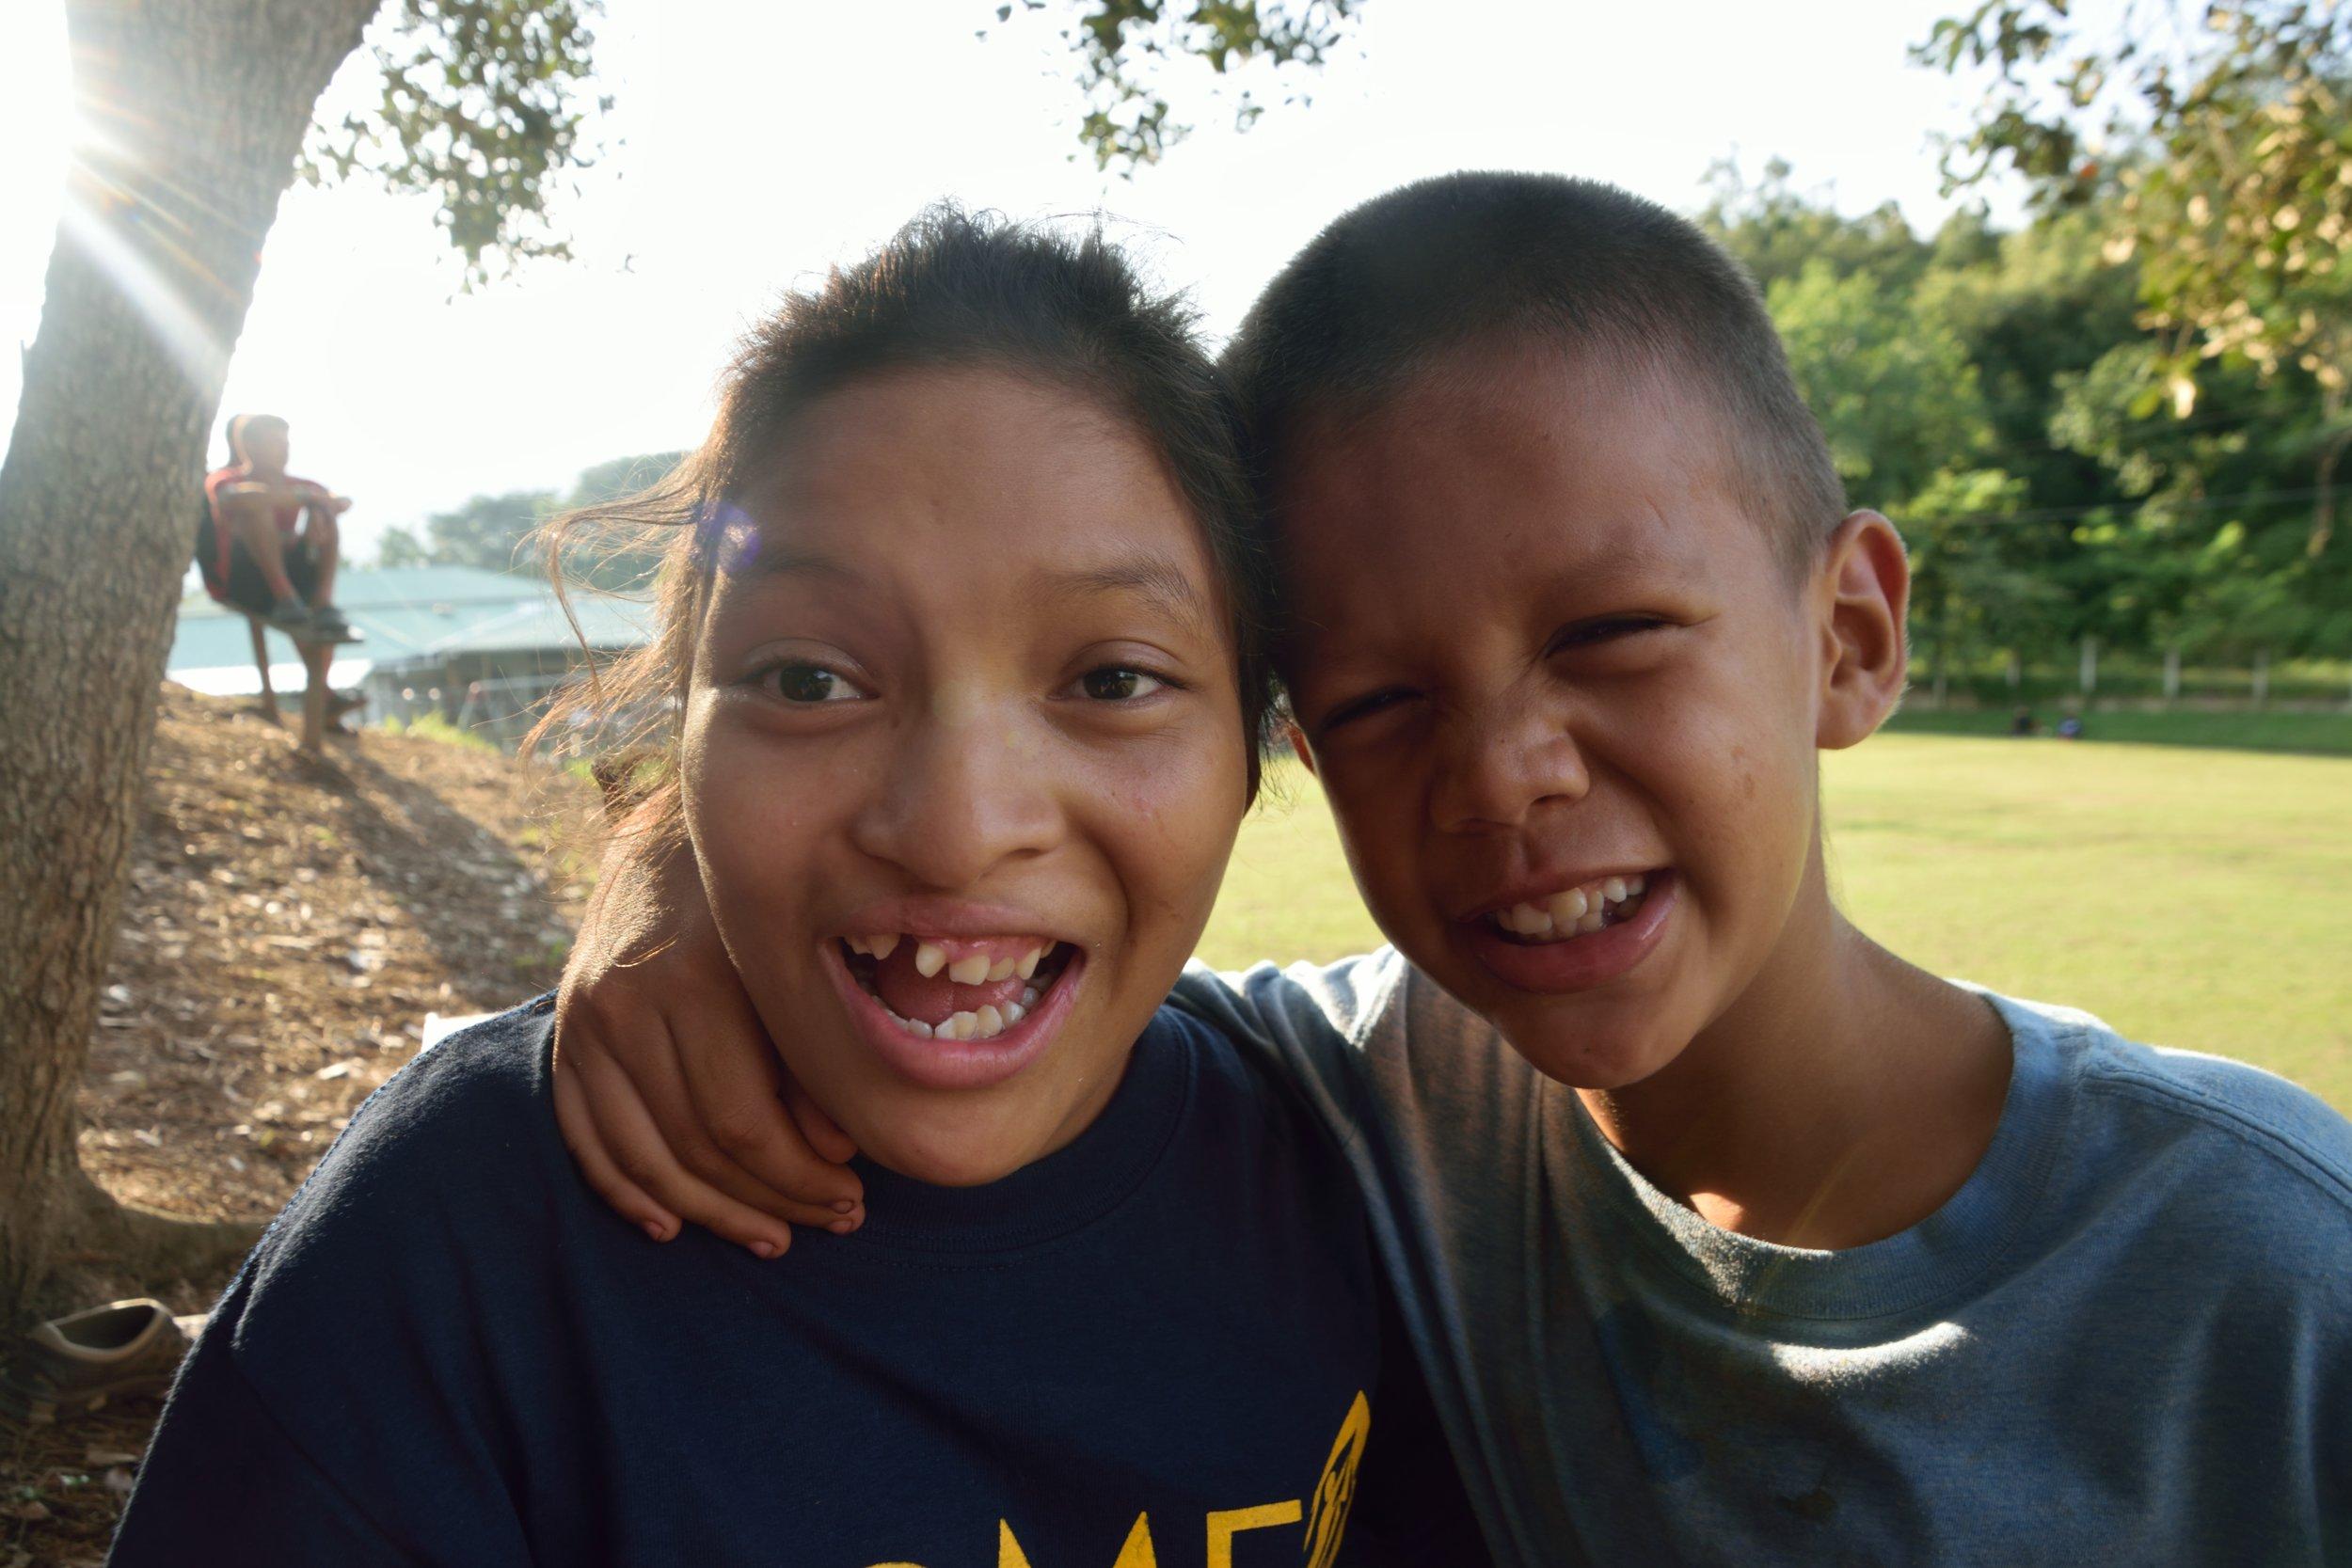 Domingo and his close friend and classmate, Nina.*